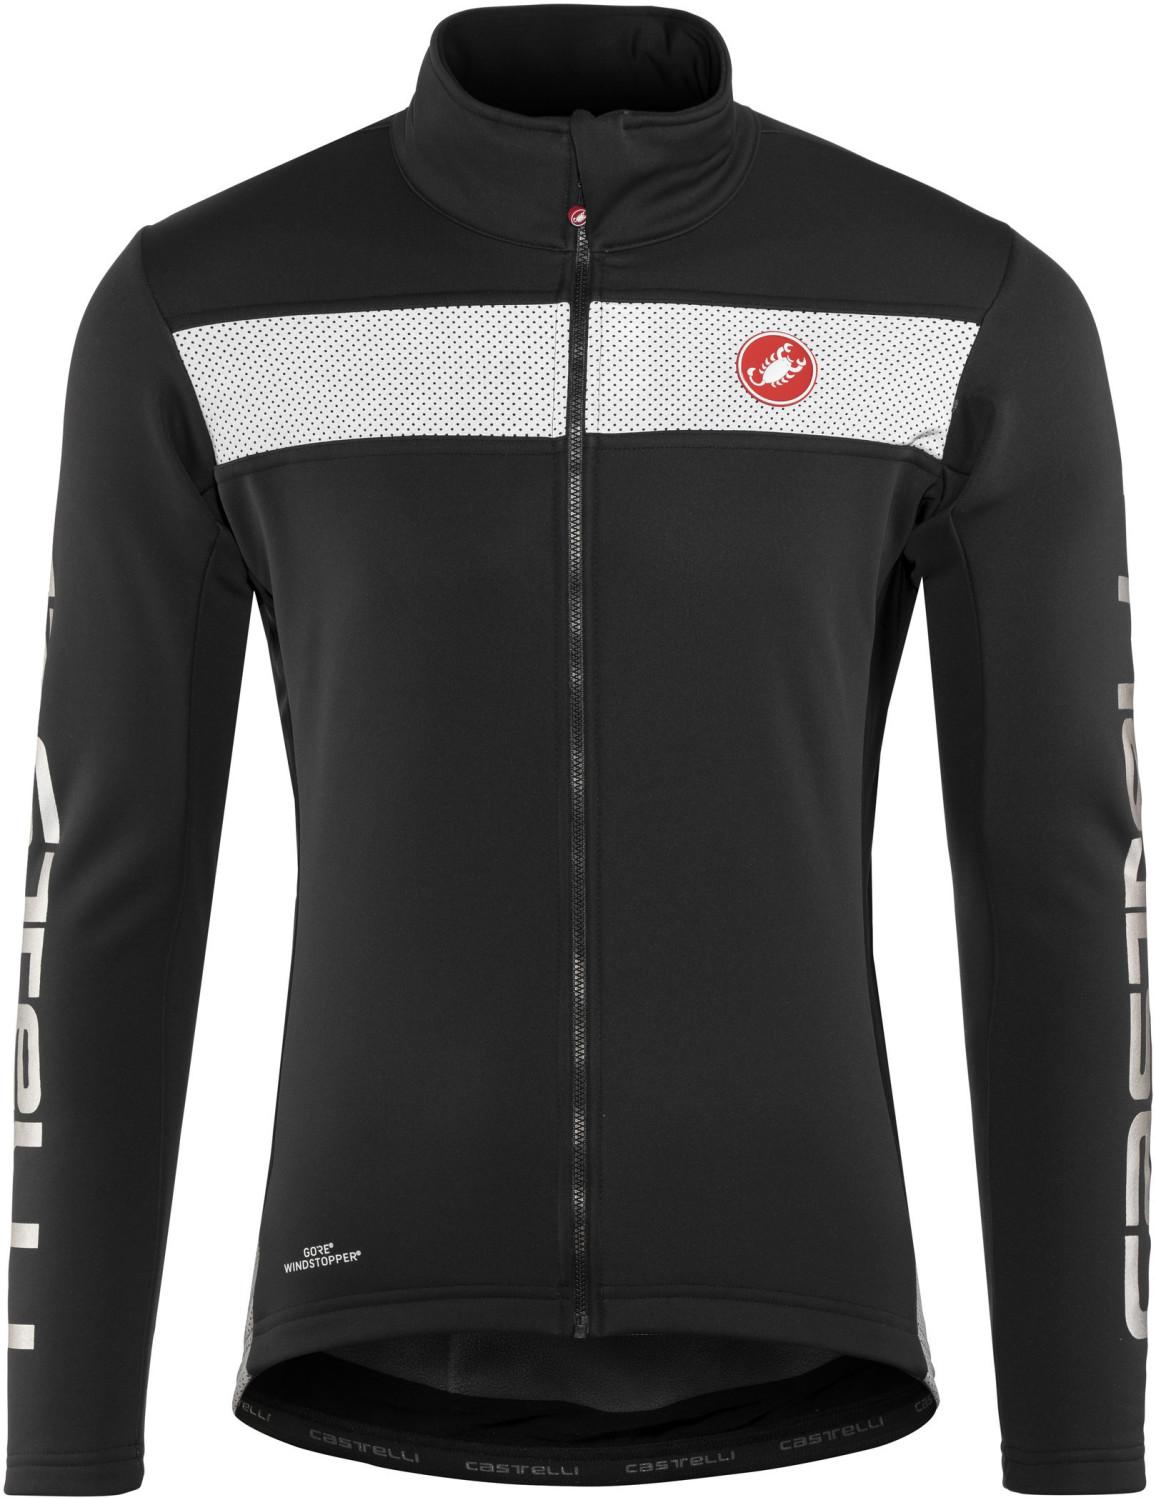 Castelli Raddoppia Jacket black